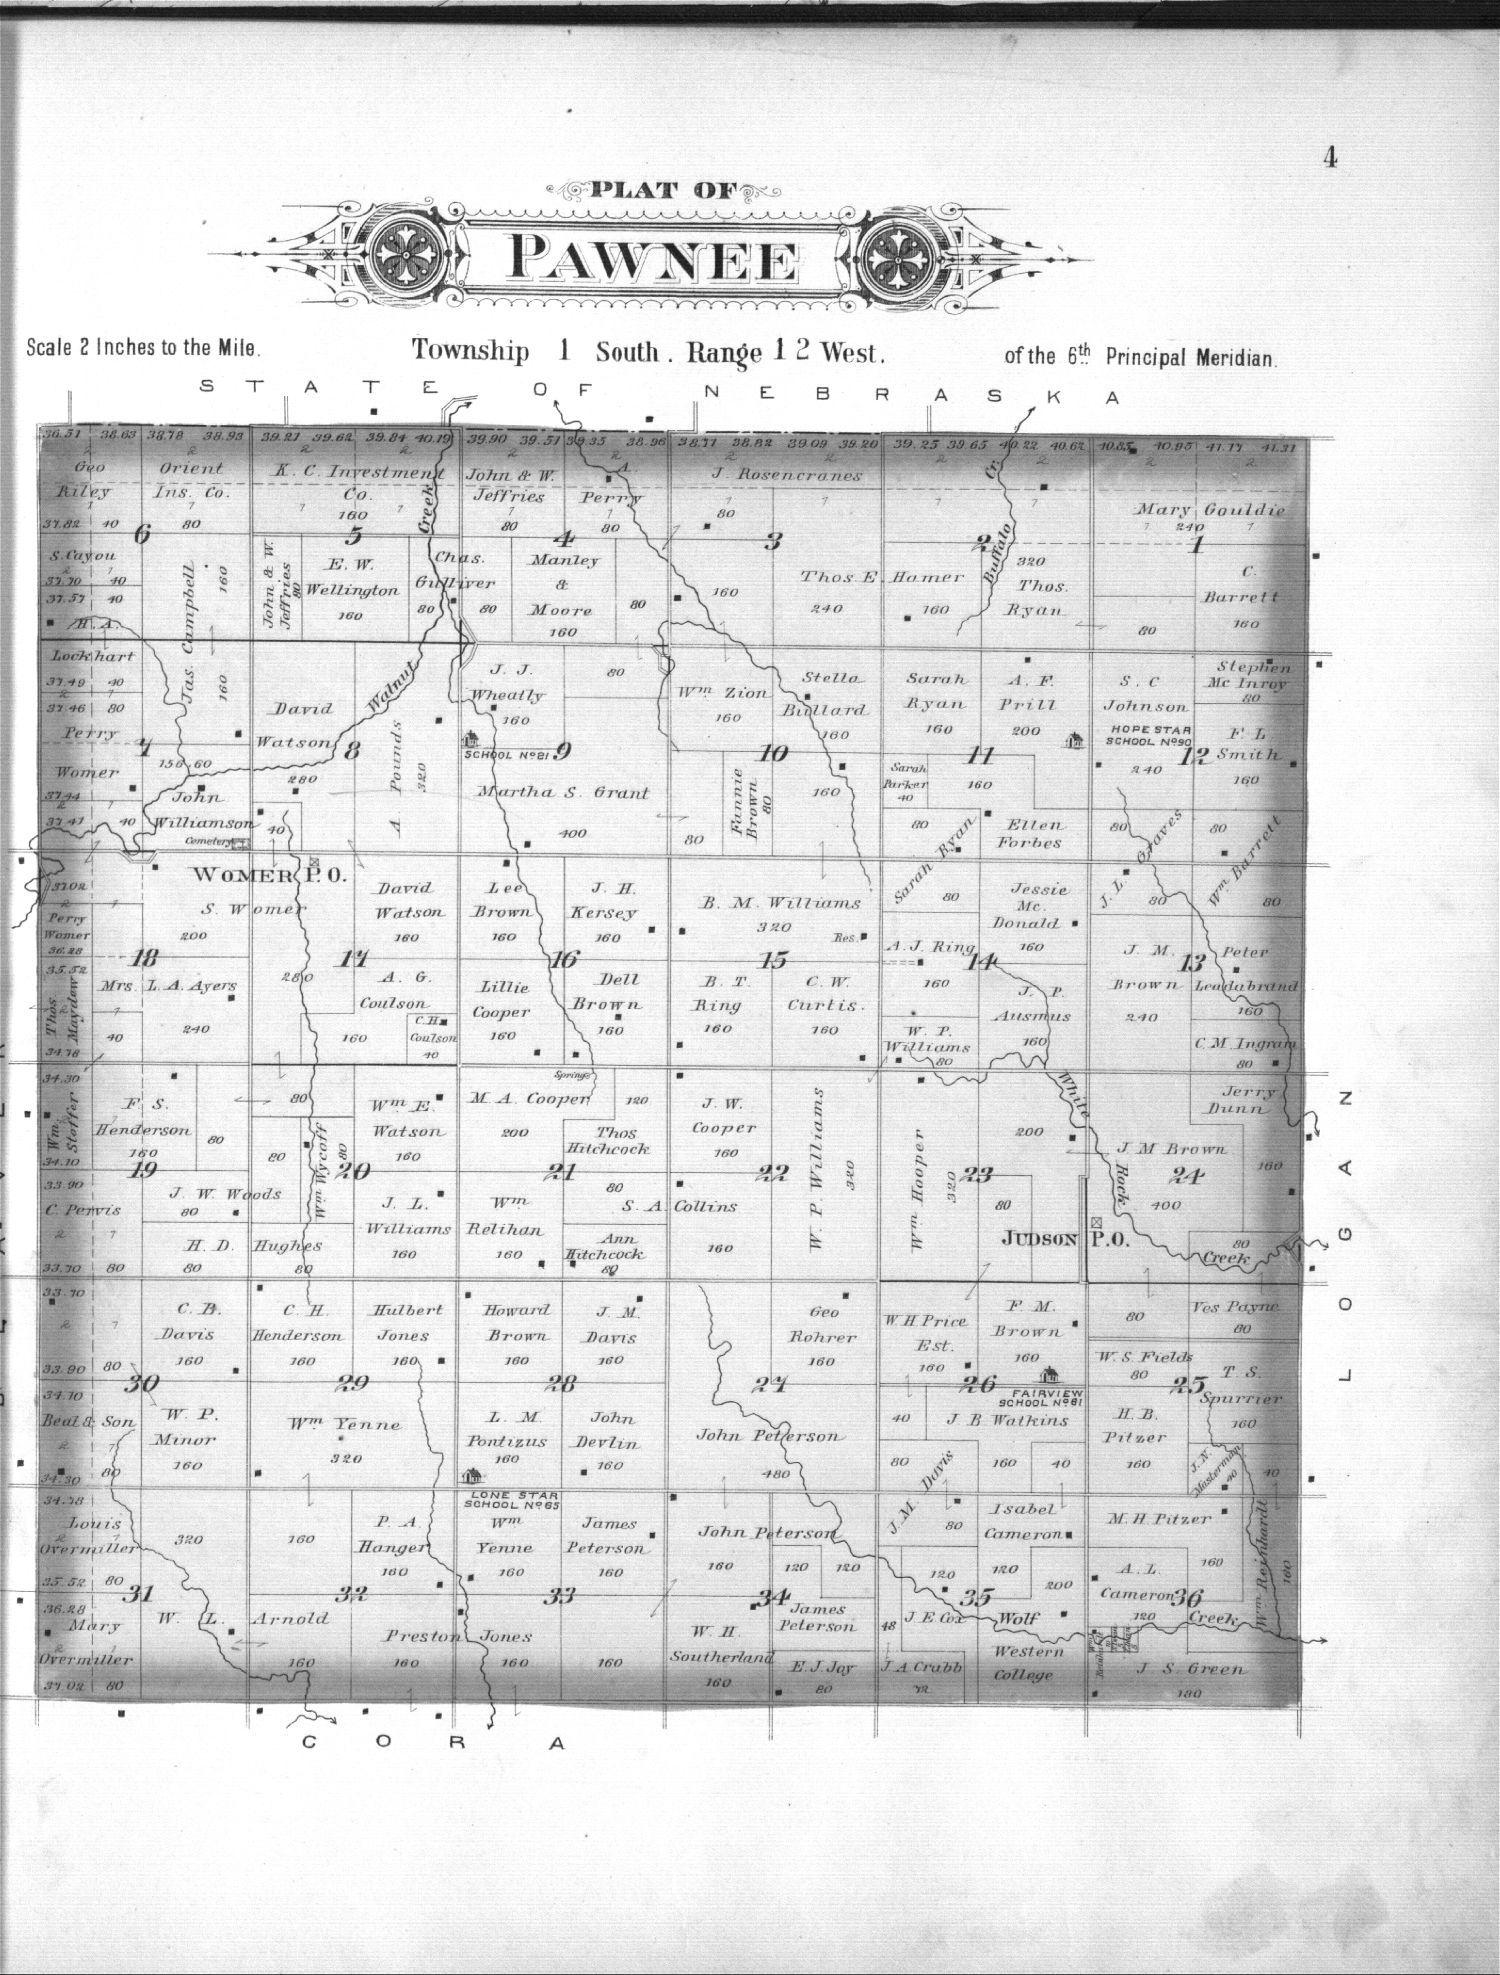 Plat book, Smith County, Kansas - 4